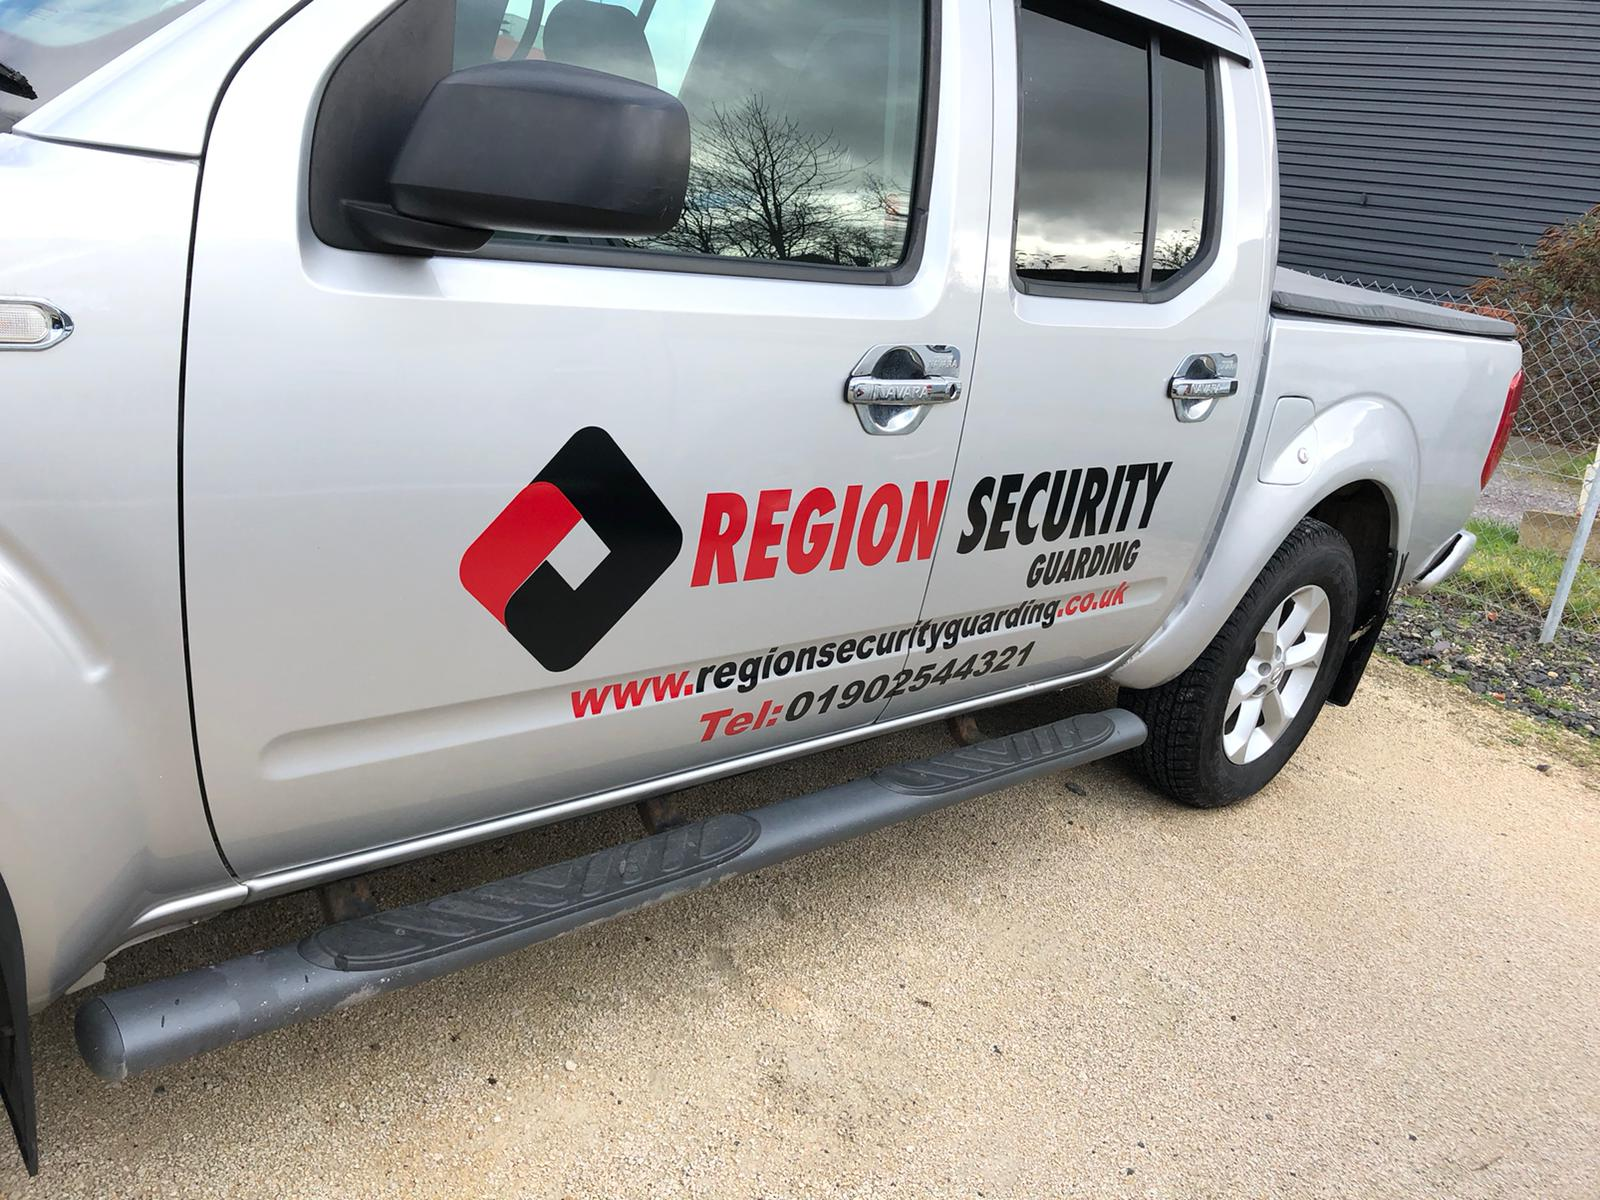 Security Company Saint Asaph